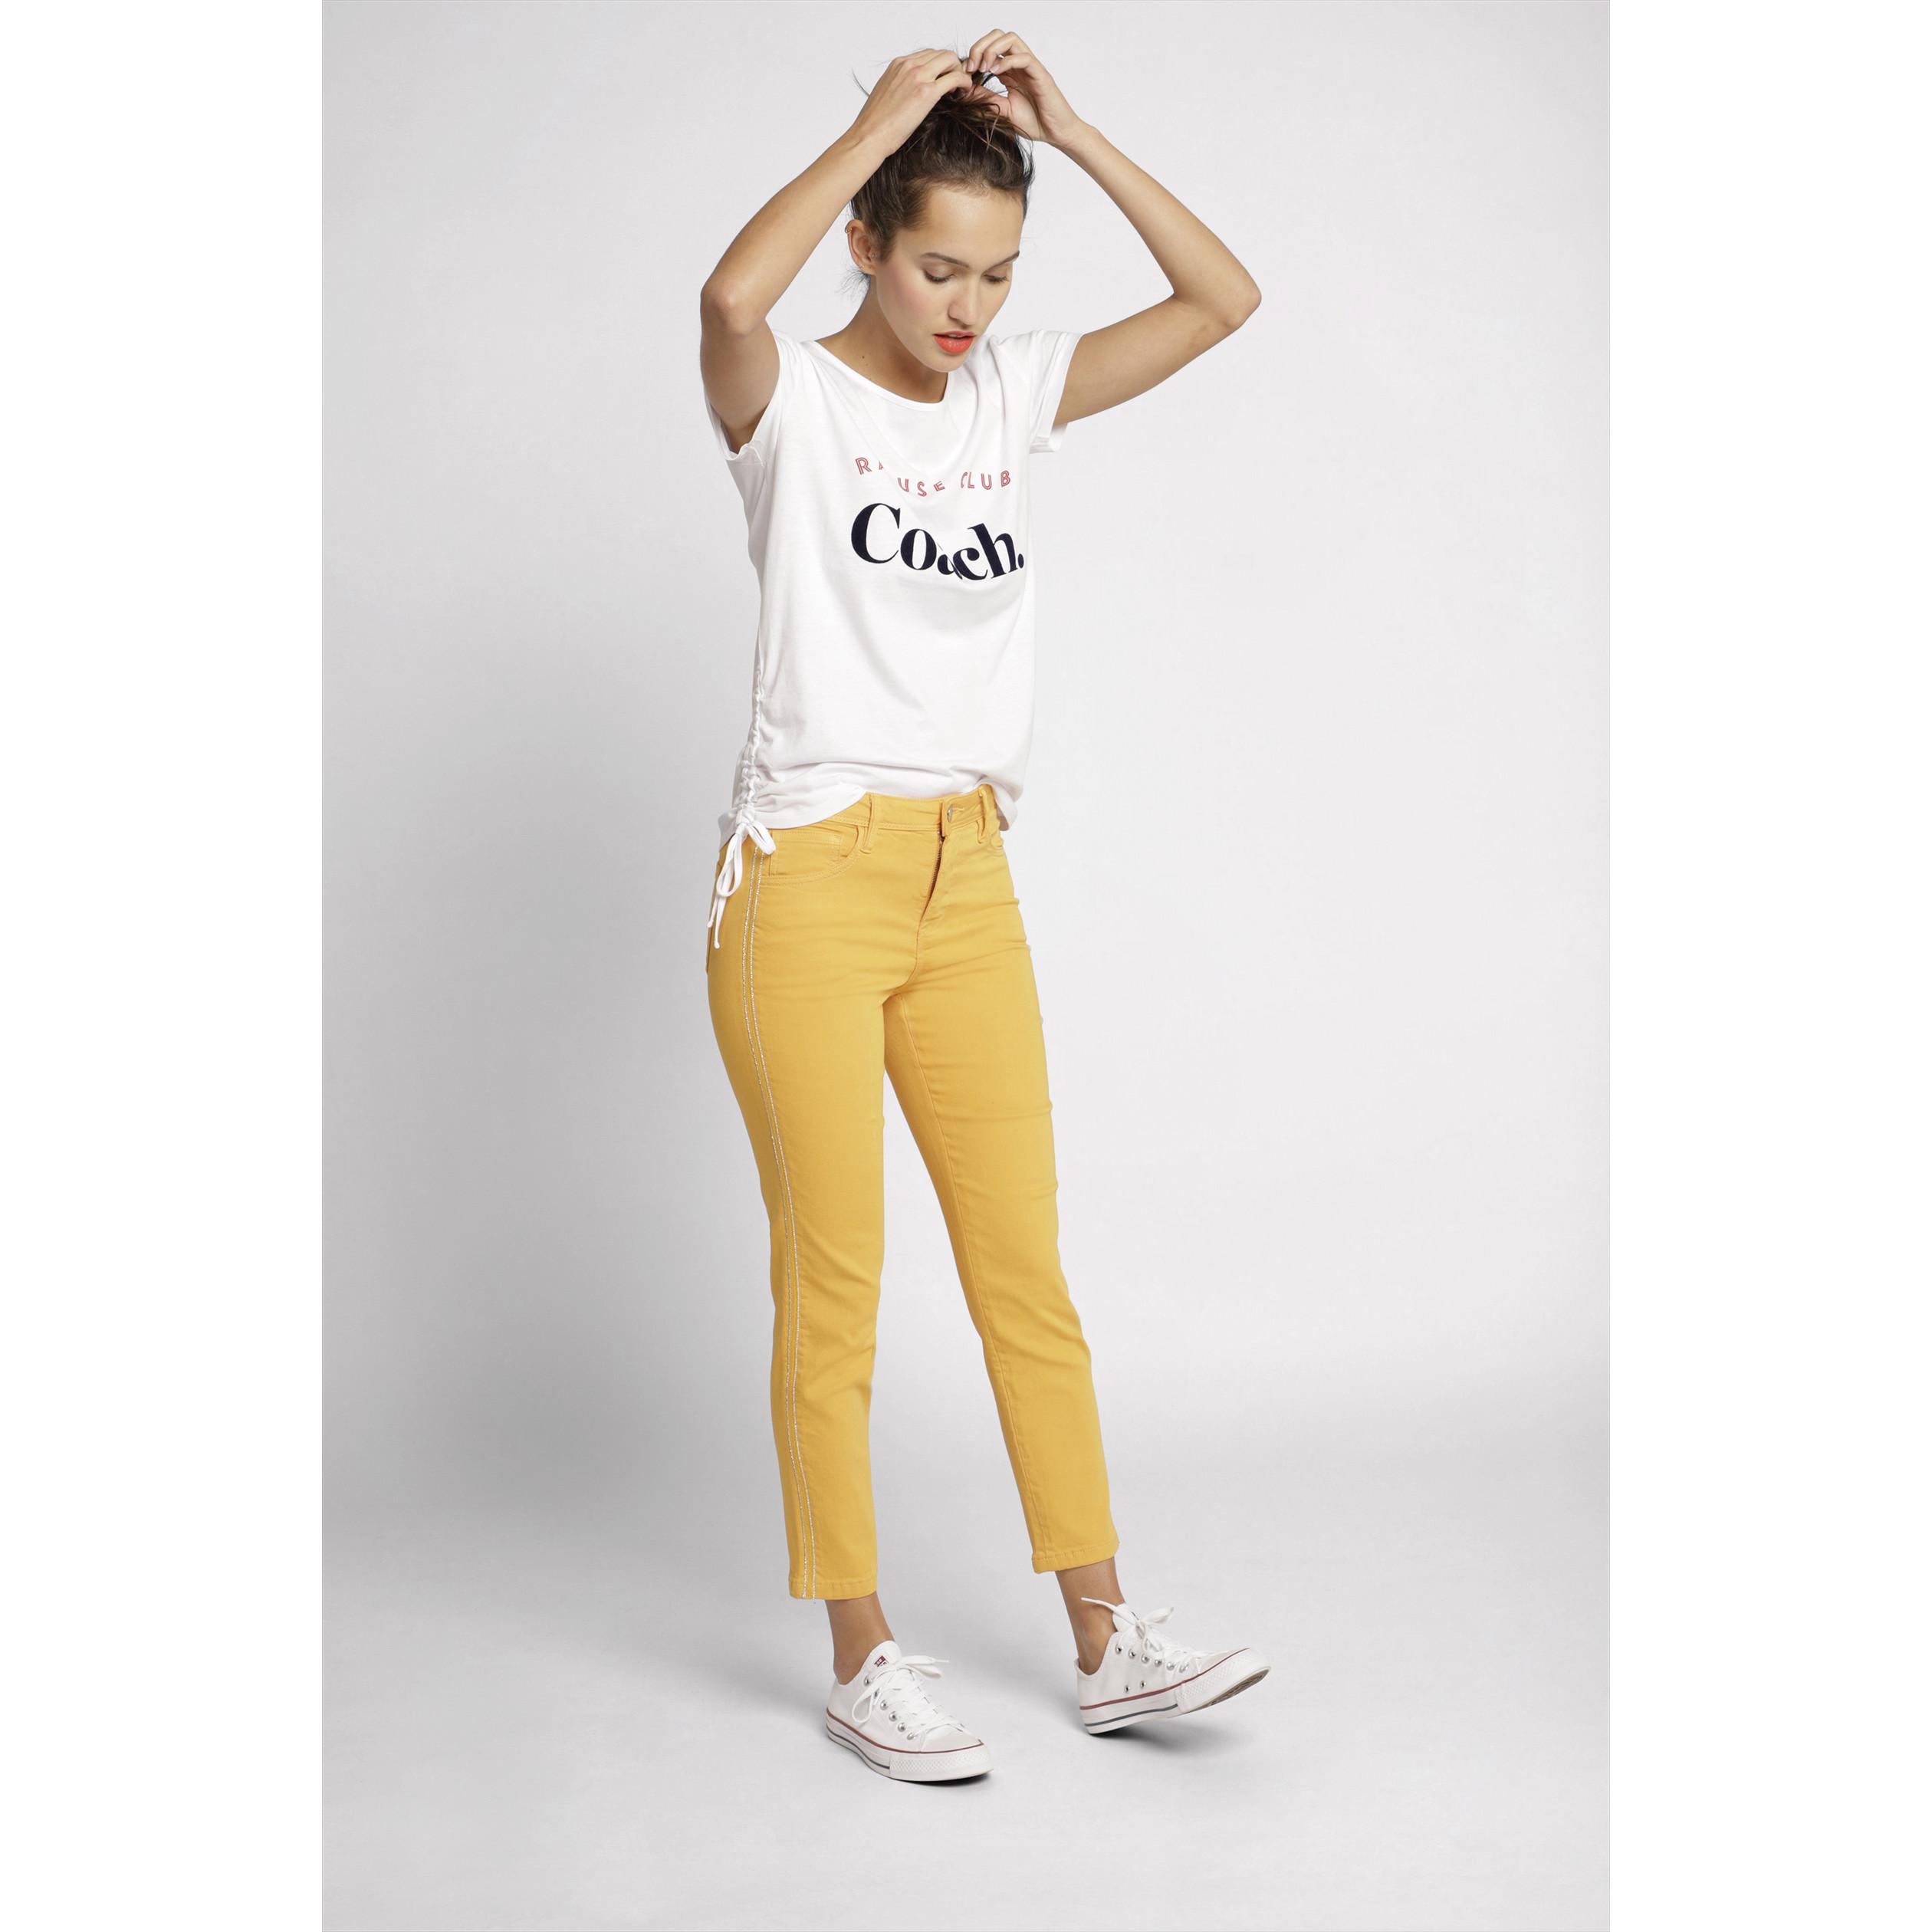 Or Pantalon Jaune Raccourci Femme Slim 0vO8nmNw